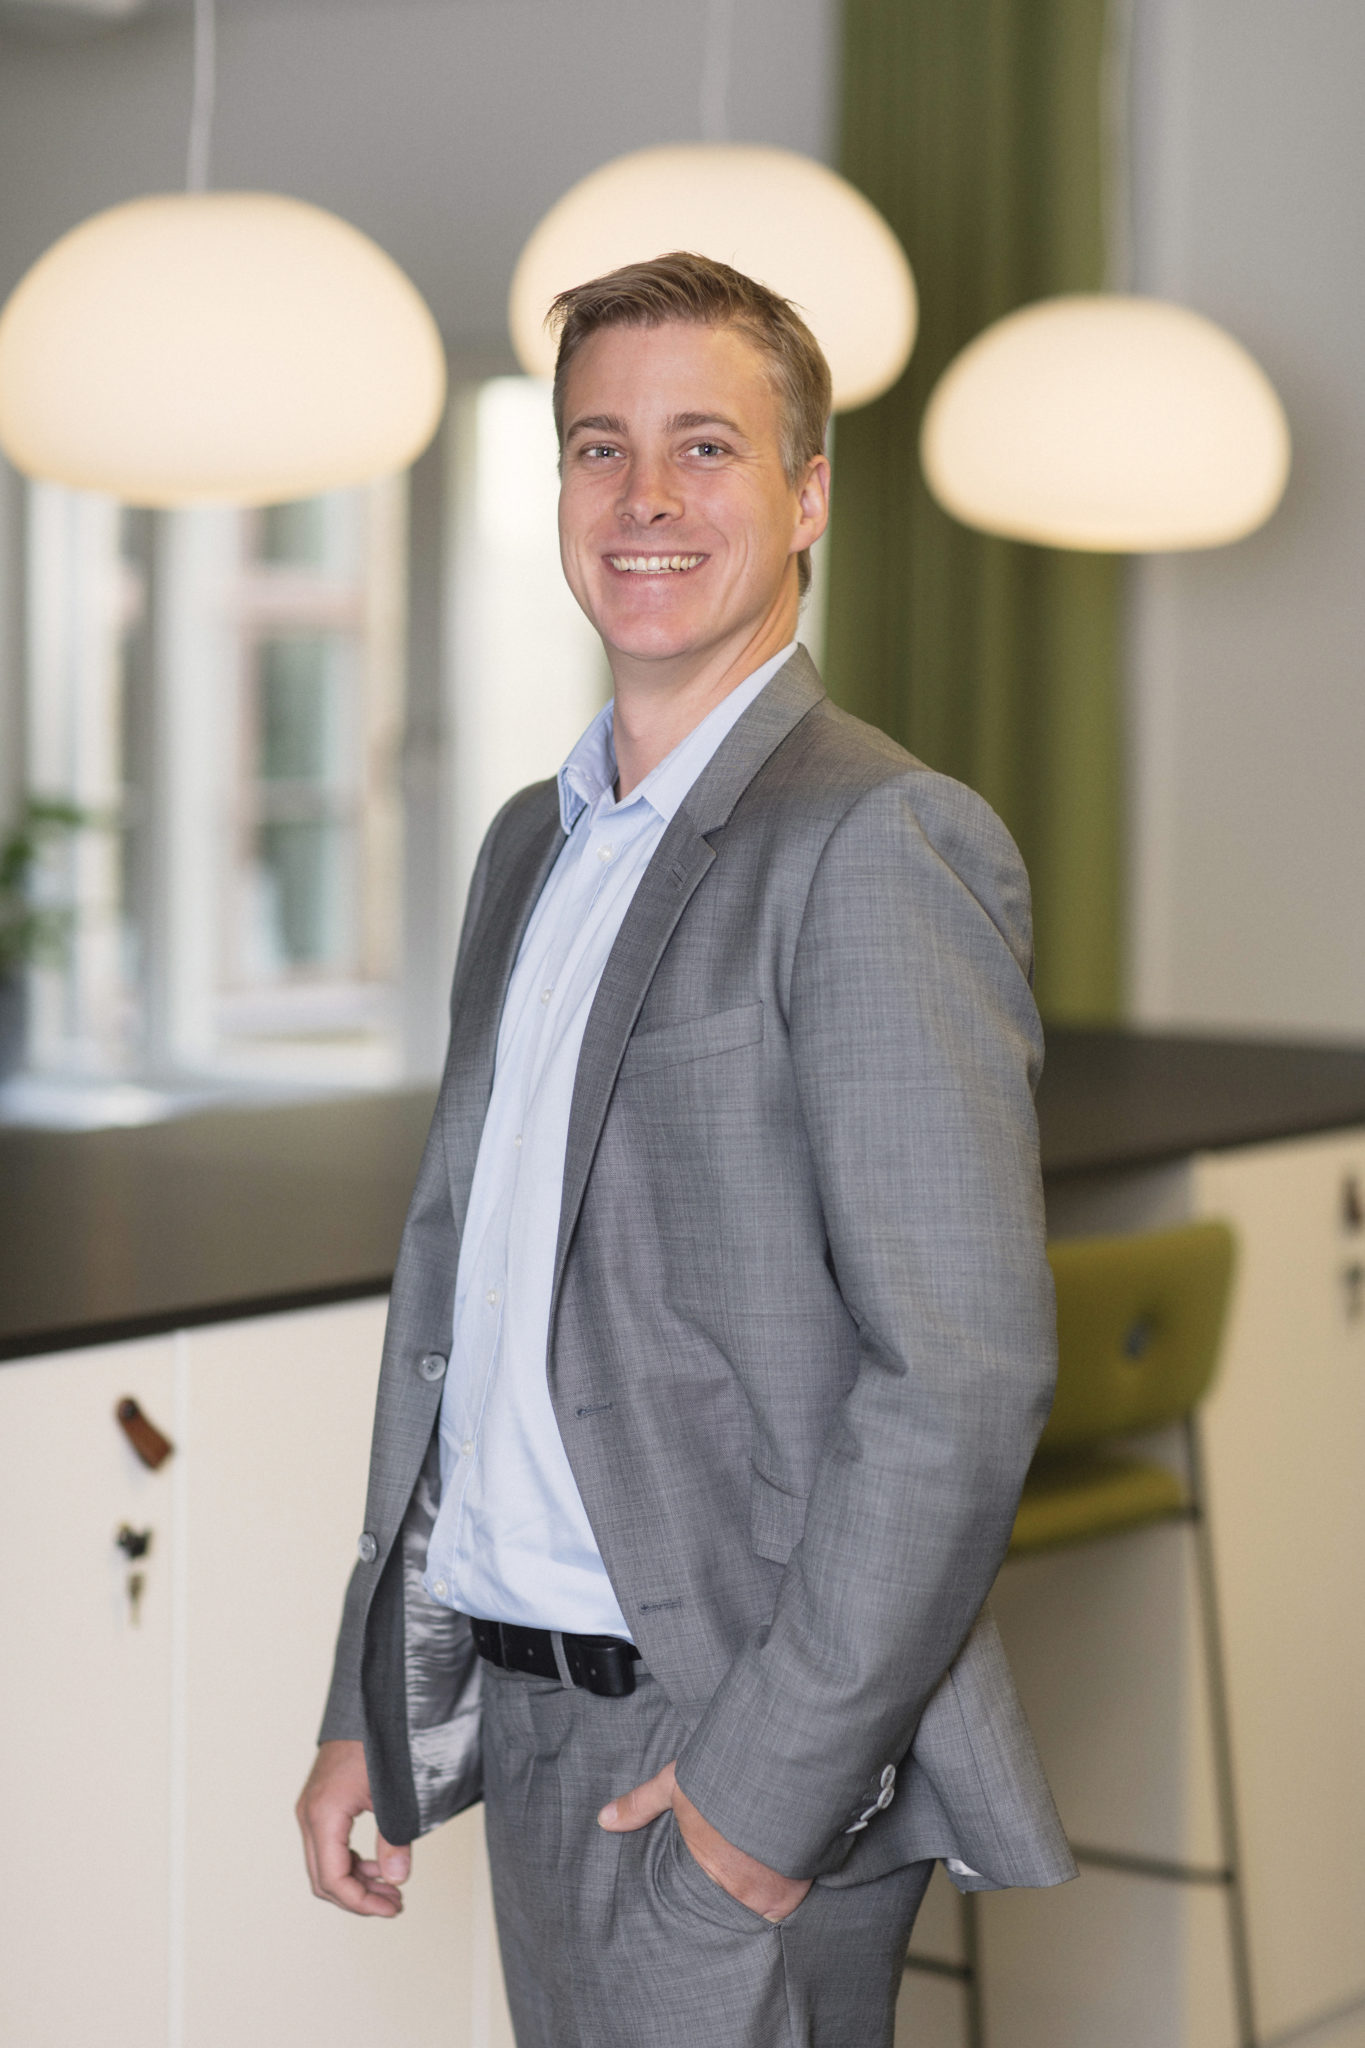 Henrik Sundqvist